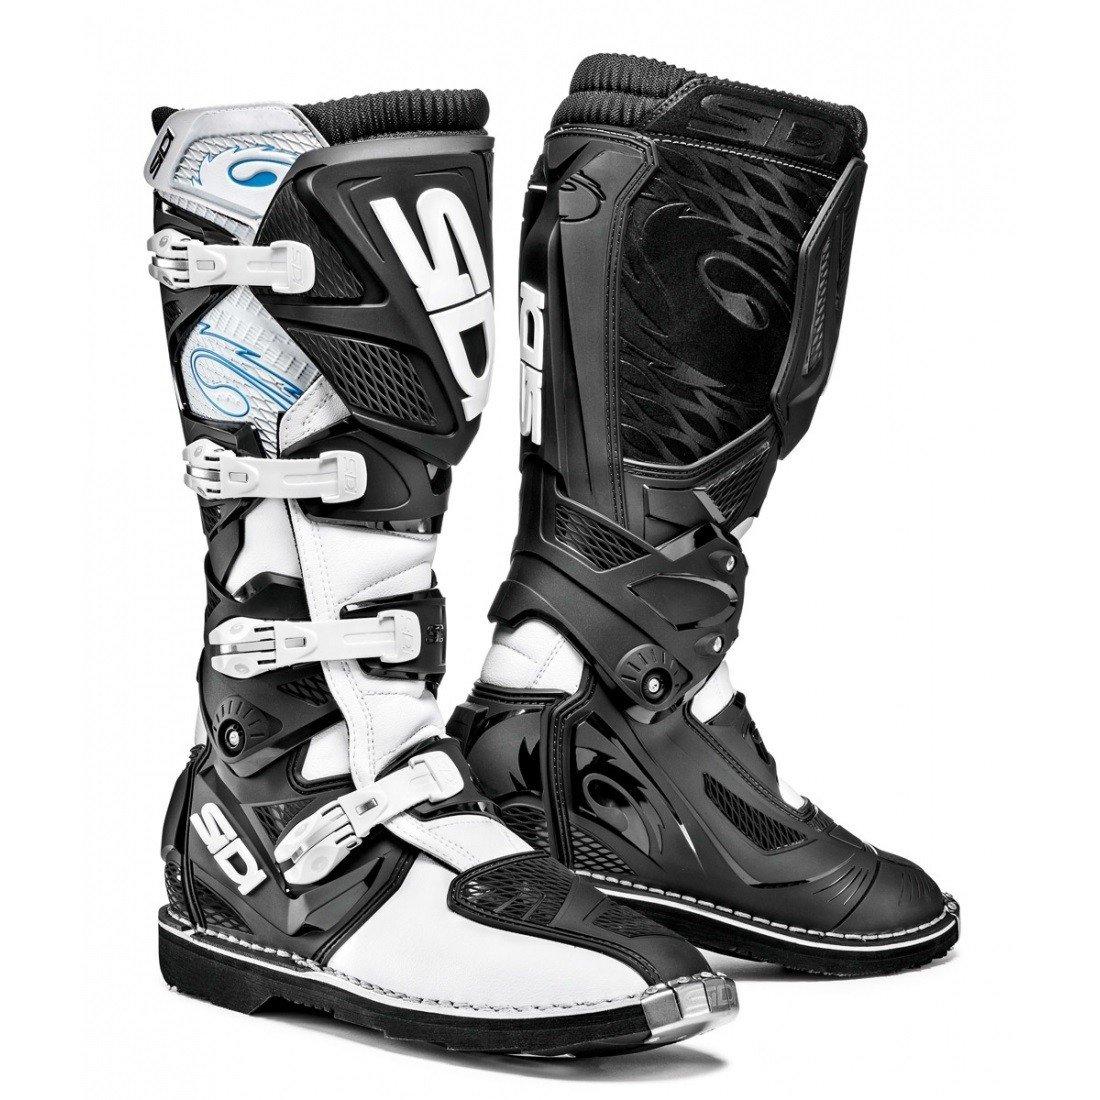 Pánské motokrosové boty SIDI X3 (bílo/černé) 42